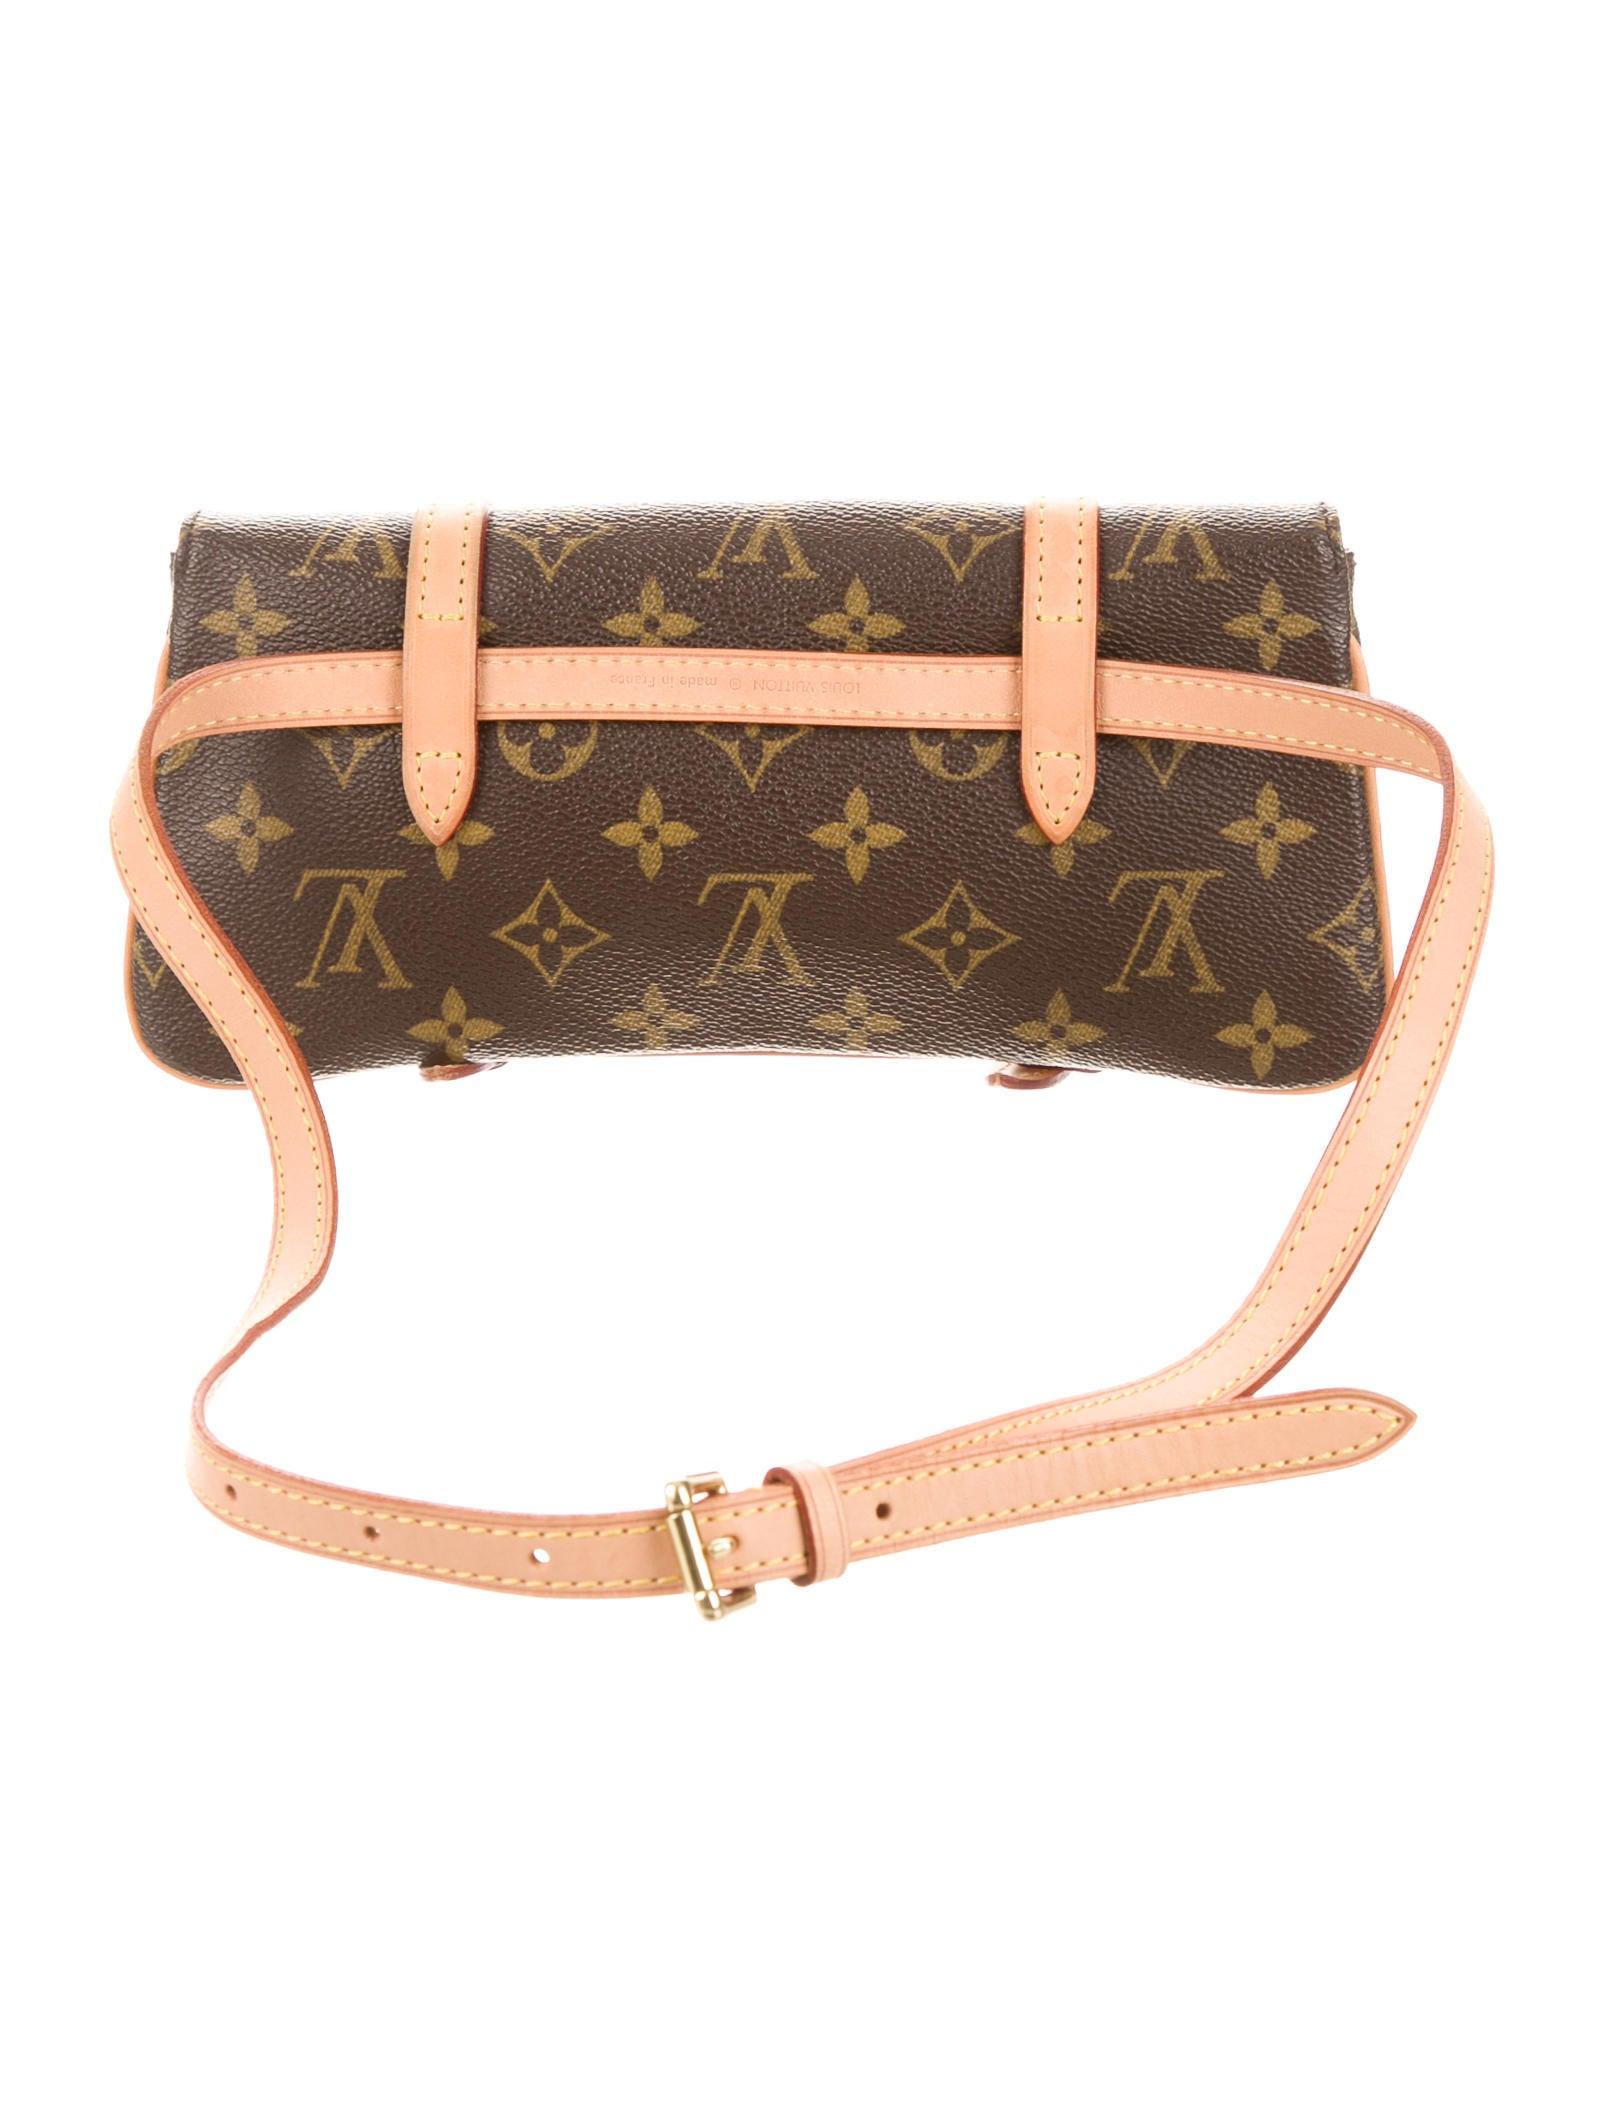 Eclectic Decor Louis Vuitton Monogram Marelle Waist Bag Handbags